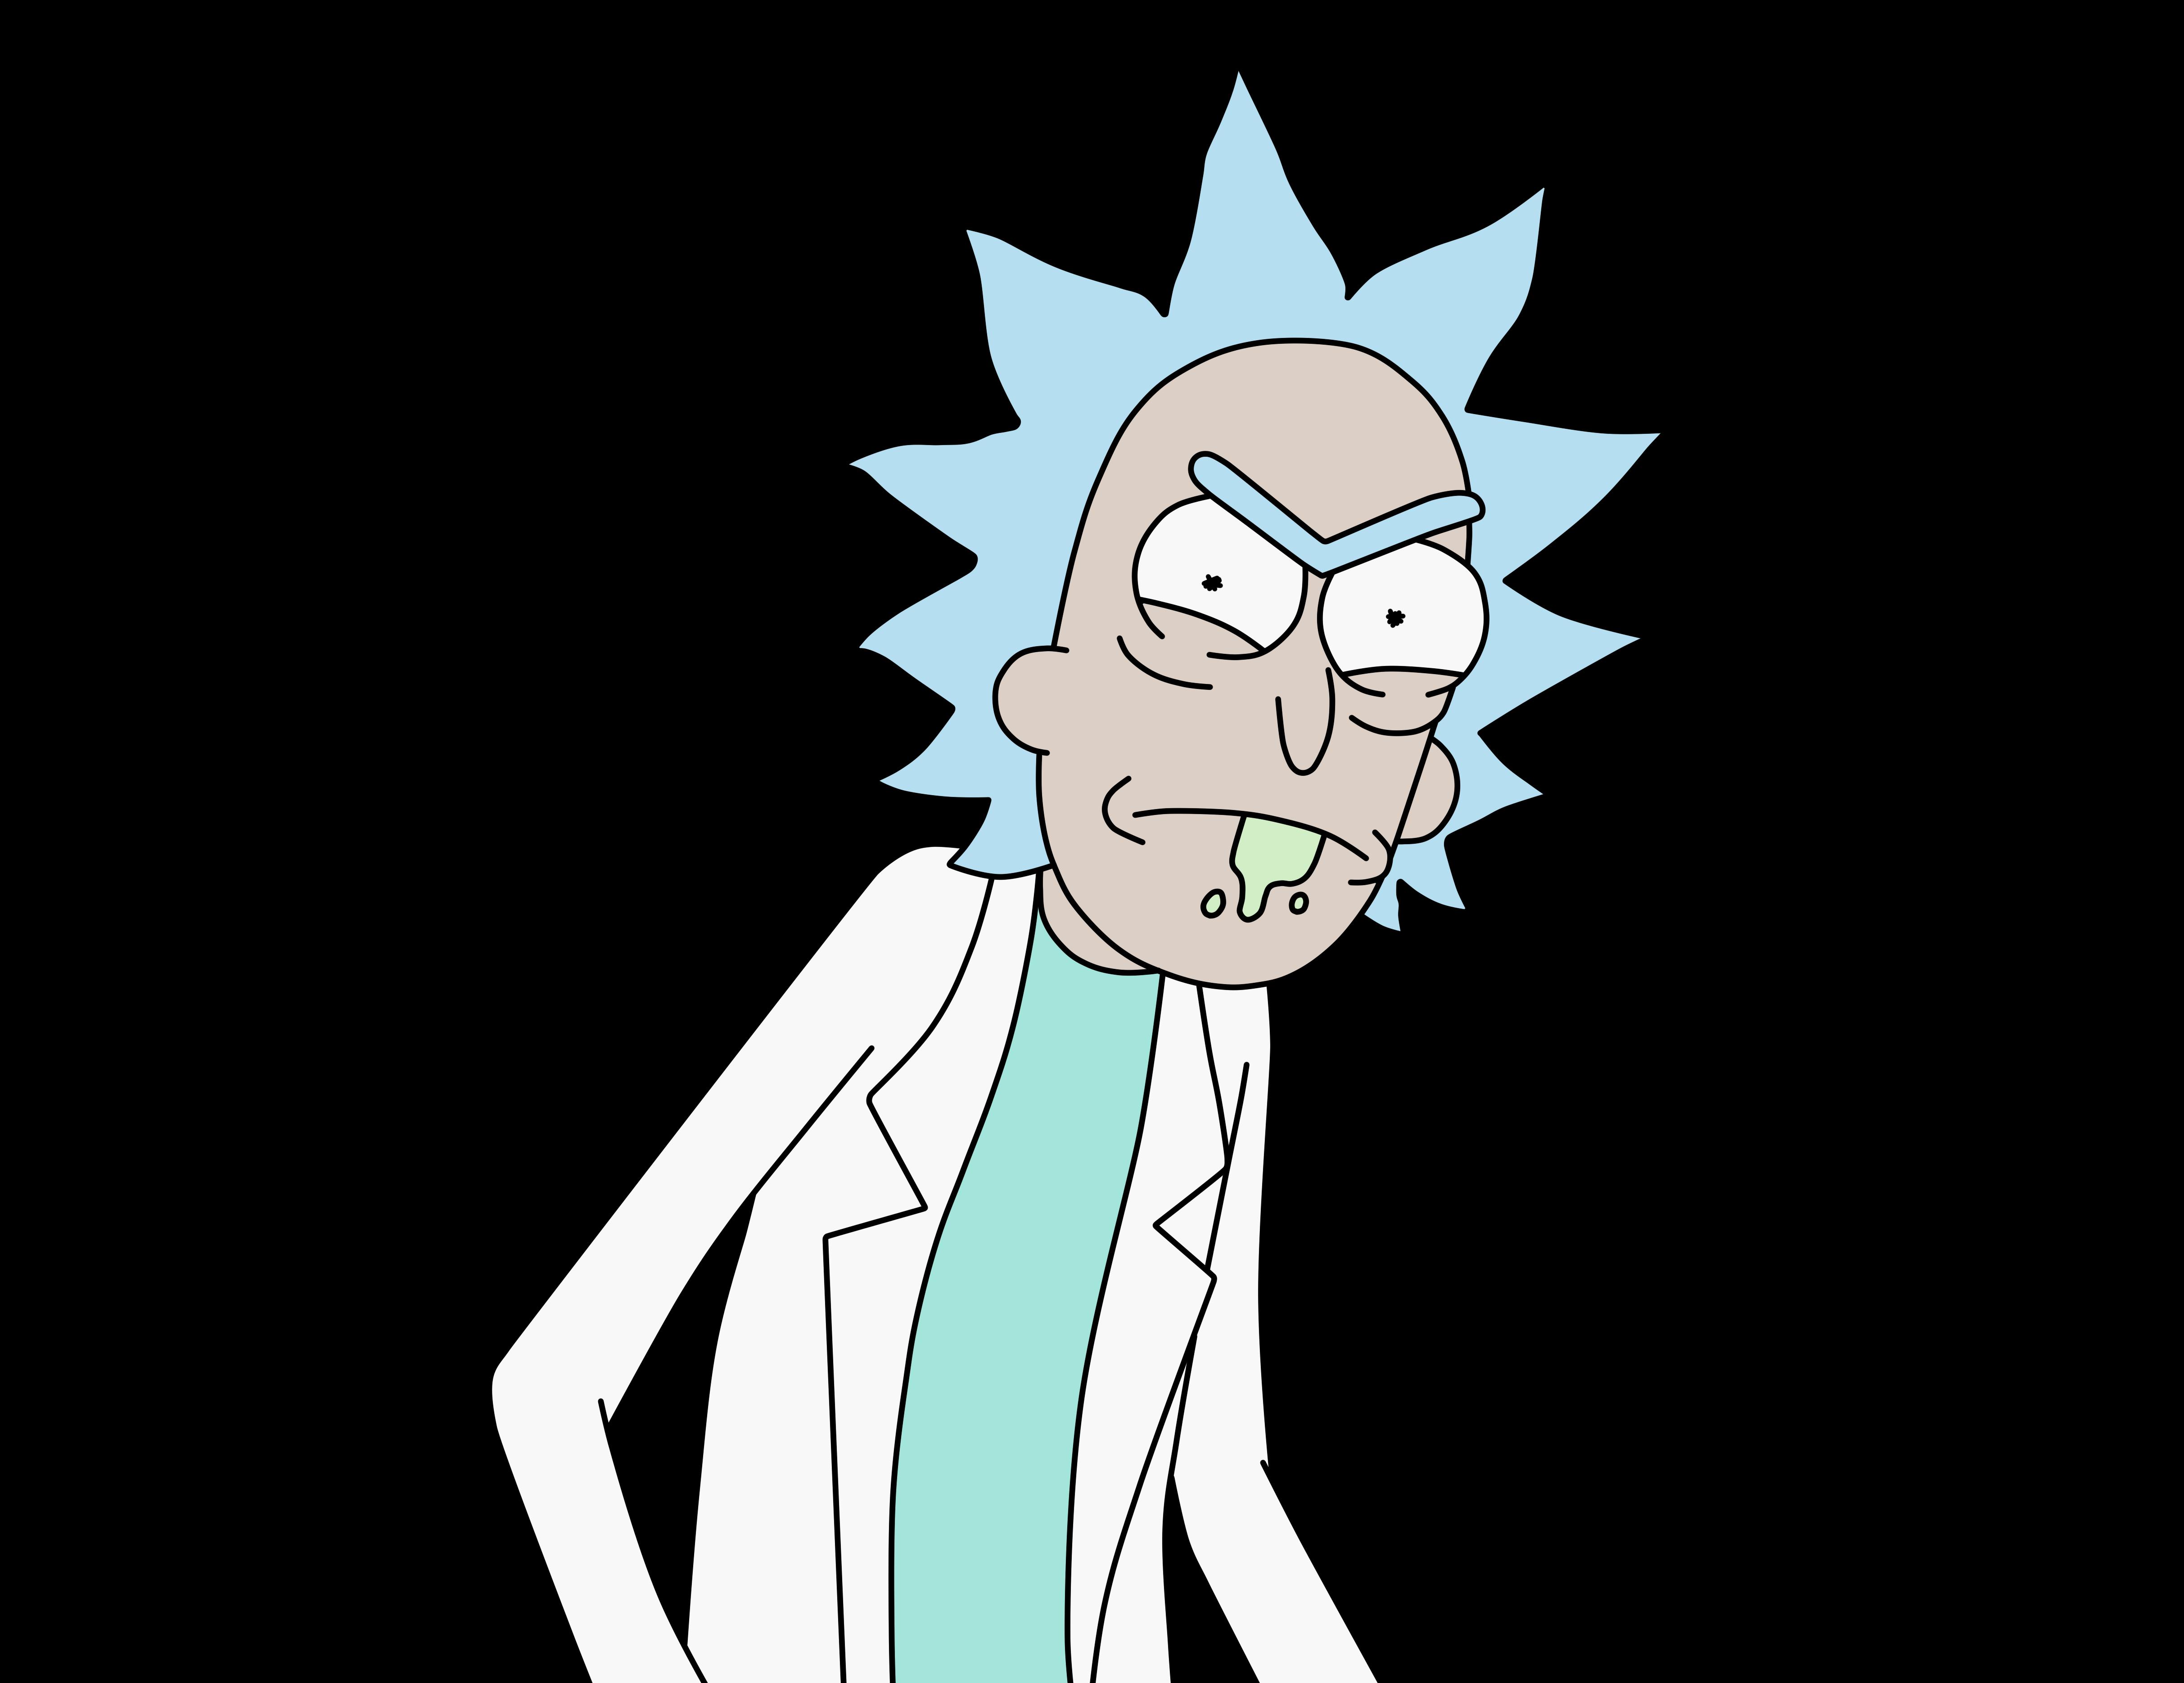 Rick and Morty S03E06: Non-Toxic Rick Sanchez by ...